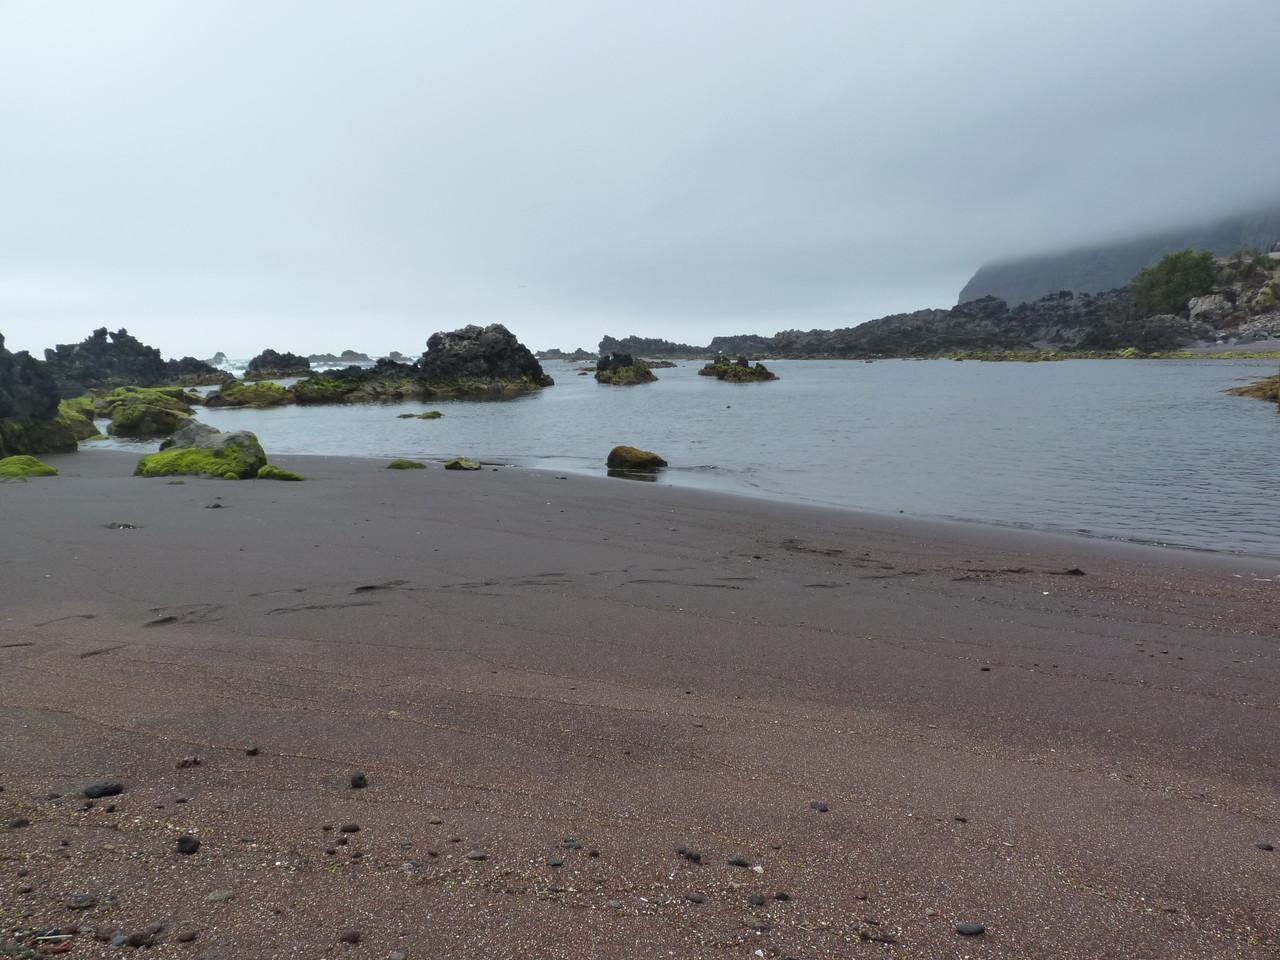 Praia da Areia 1.JPG